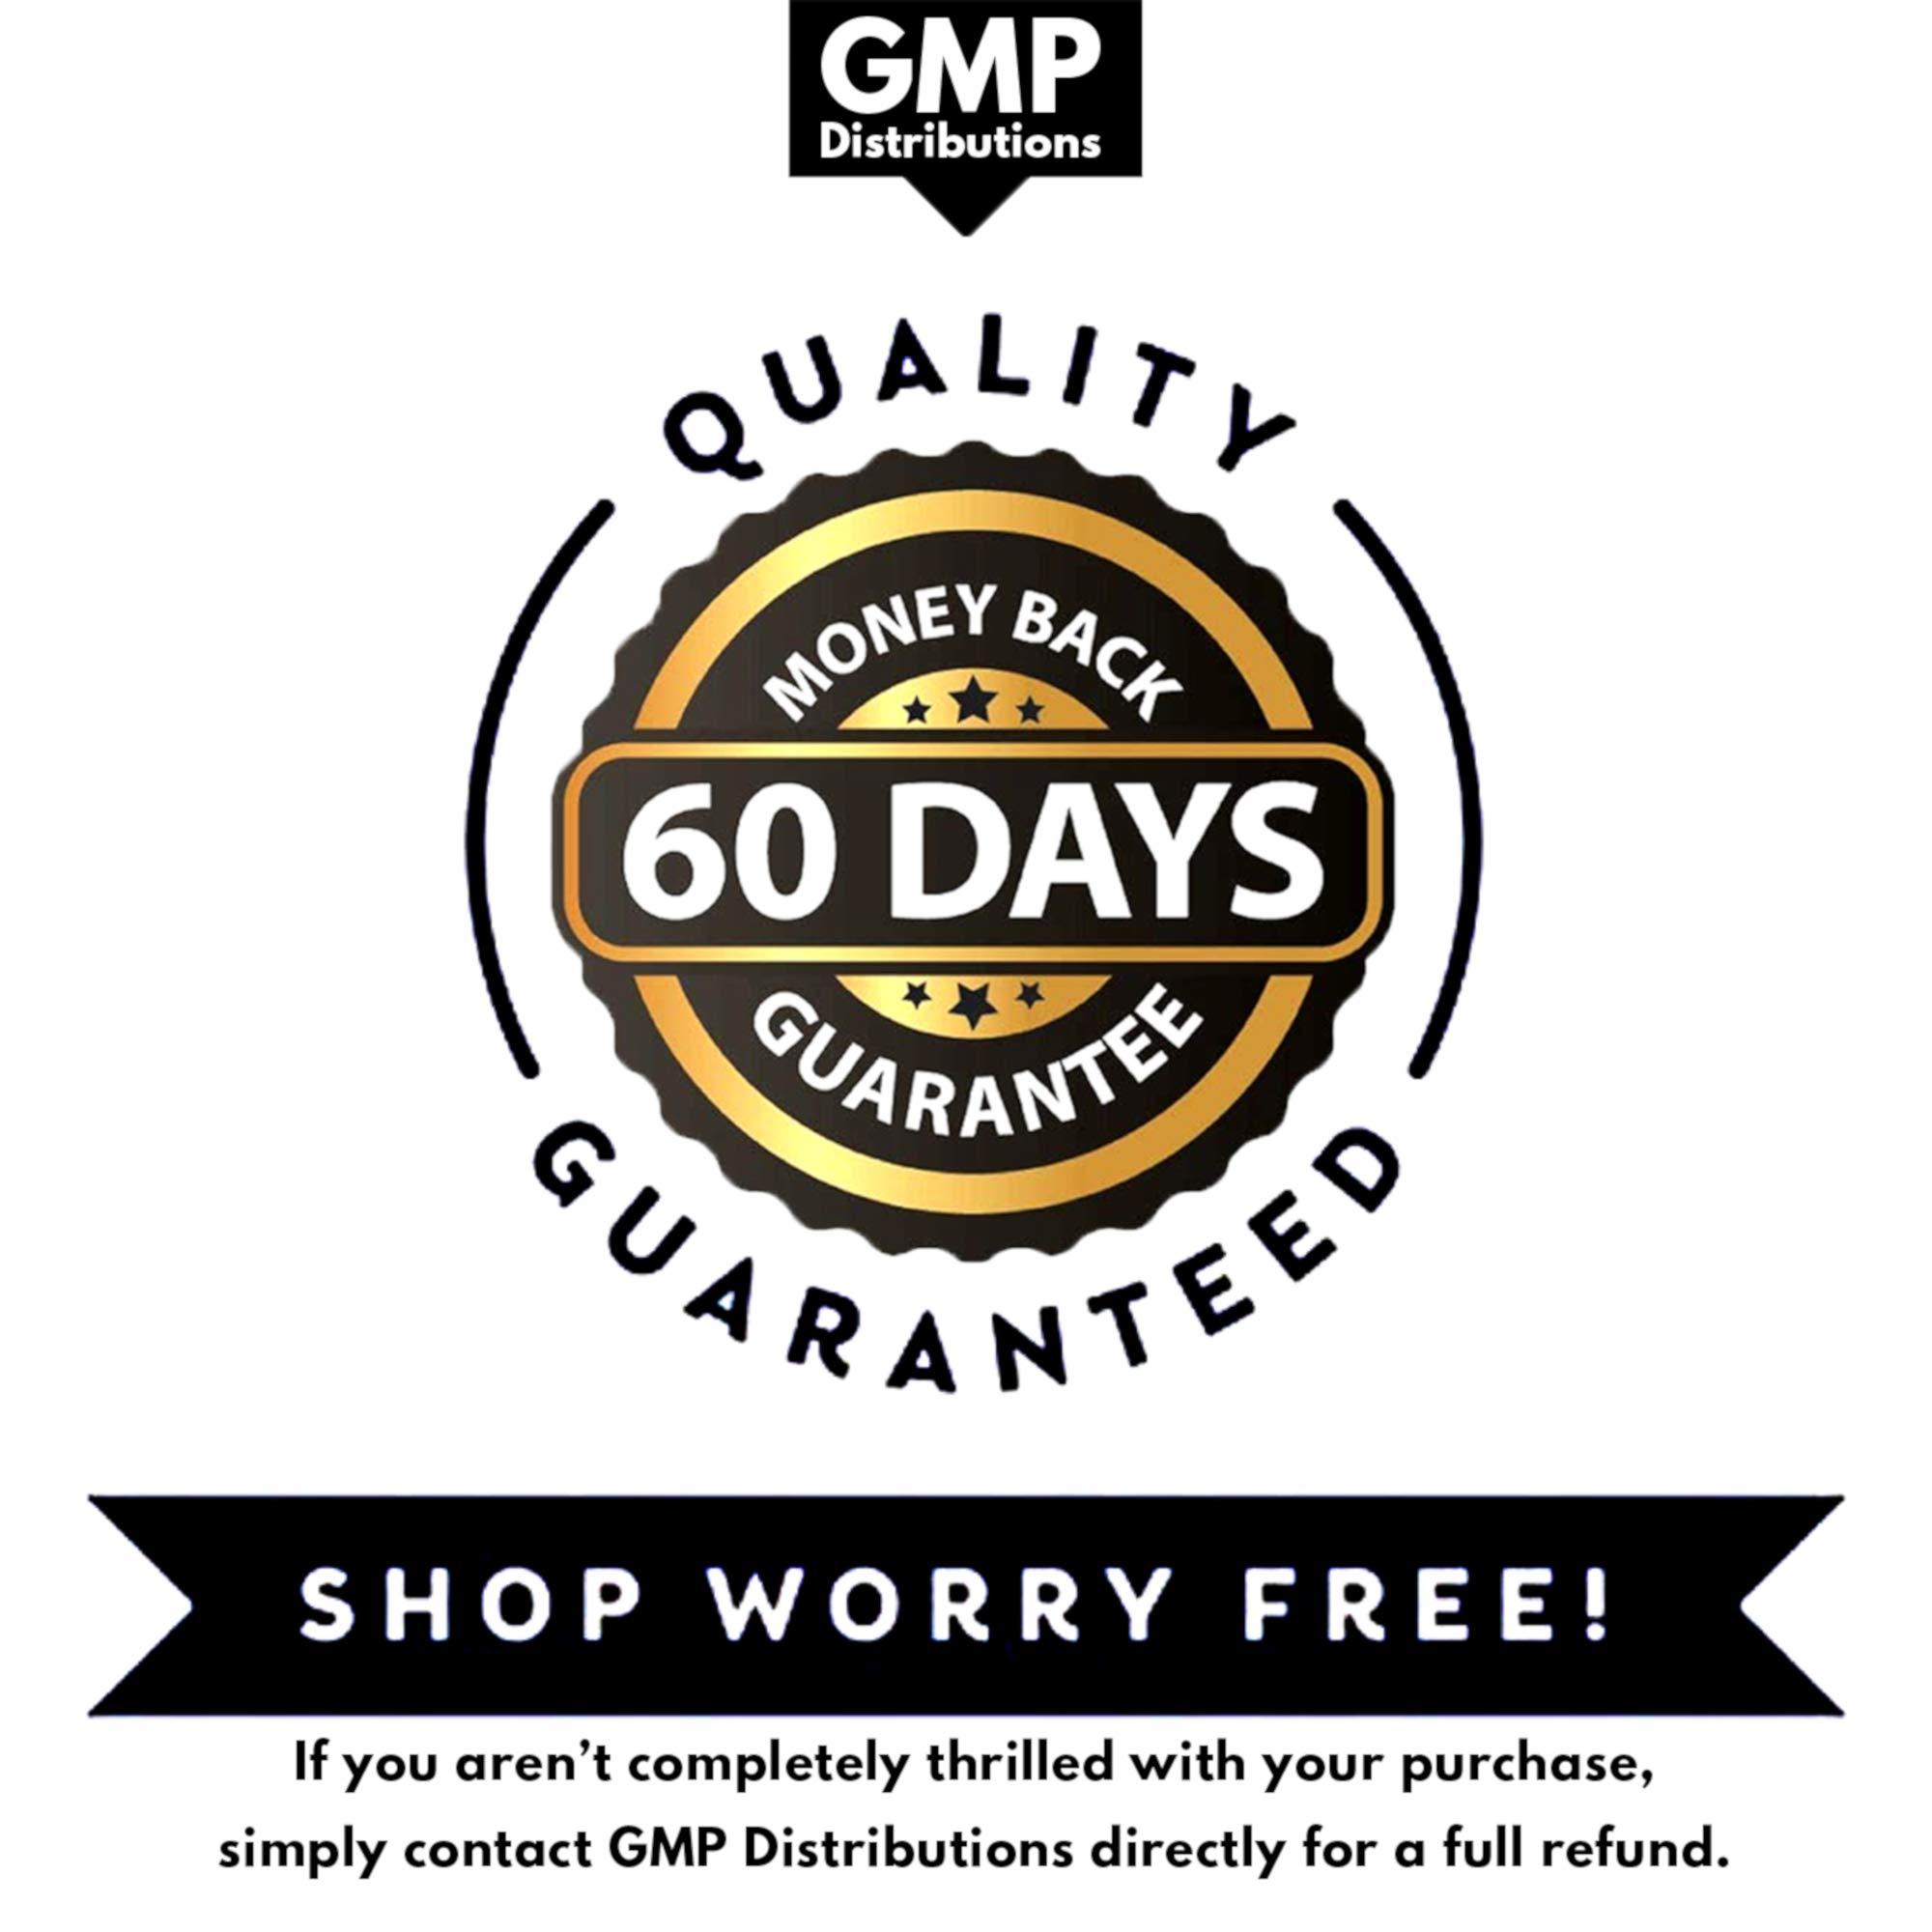 Slim Organix - 60% HCA- Maximum Strength- All Natural Fat Burner- Garcinia Cambogia Weight Loss Supplement- Carb Blocker - For Men and Women